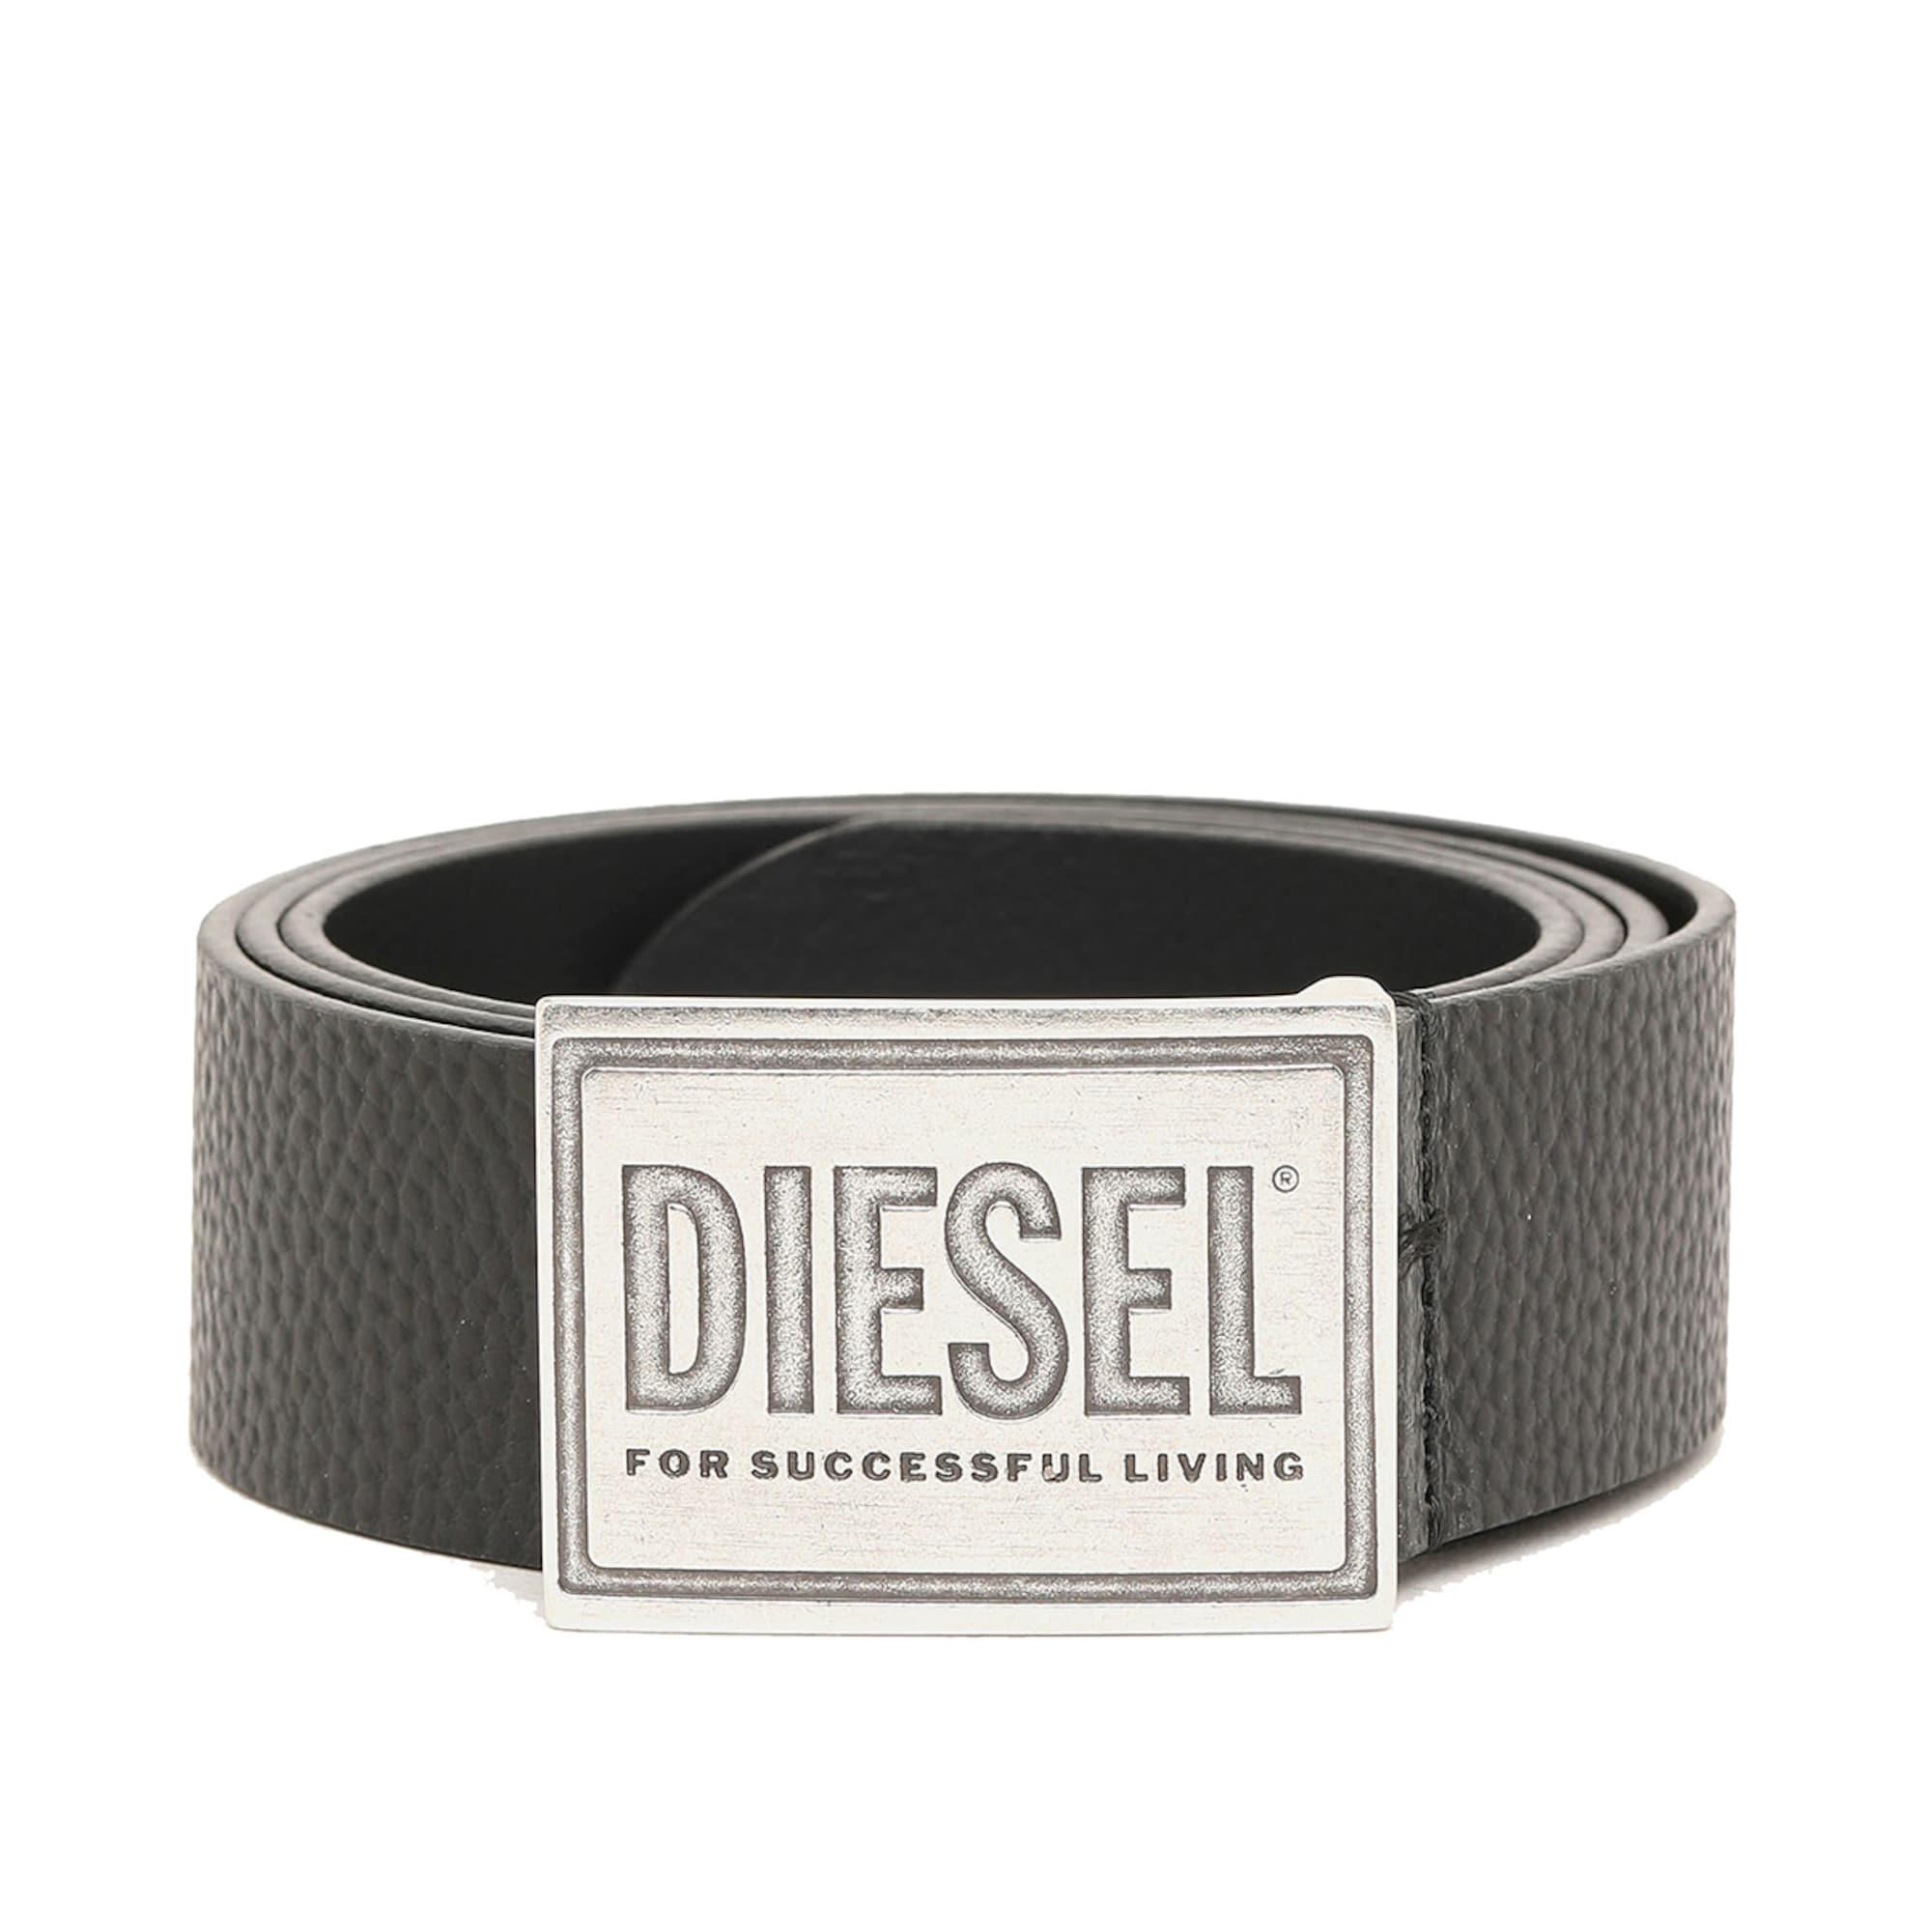 Diesel Ceinture 'B-GRAIN'  - Noir - Taille: 100 - male